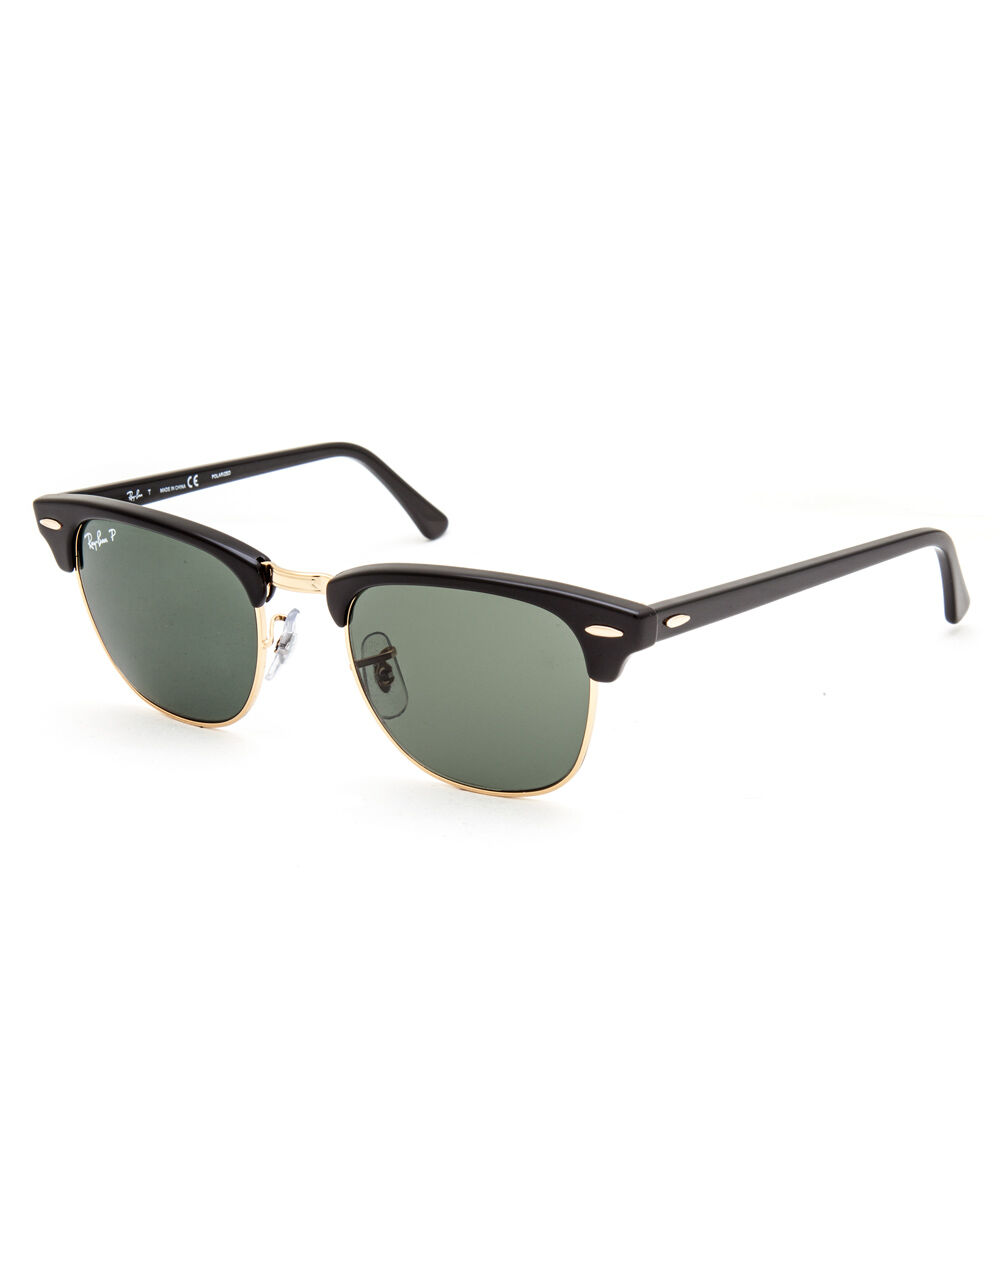 RAY-BAN Clubmaster Classic Polarized Sunglasses